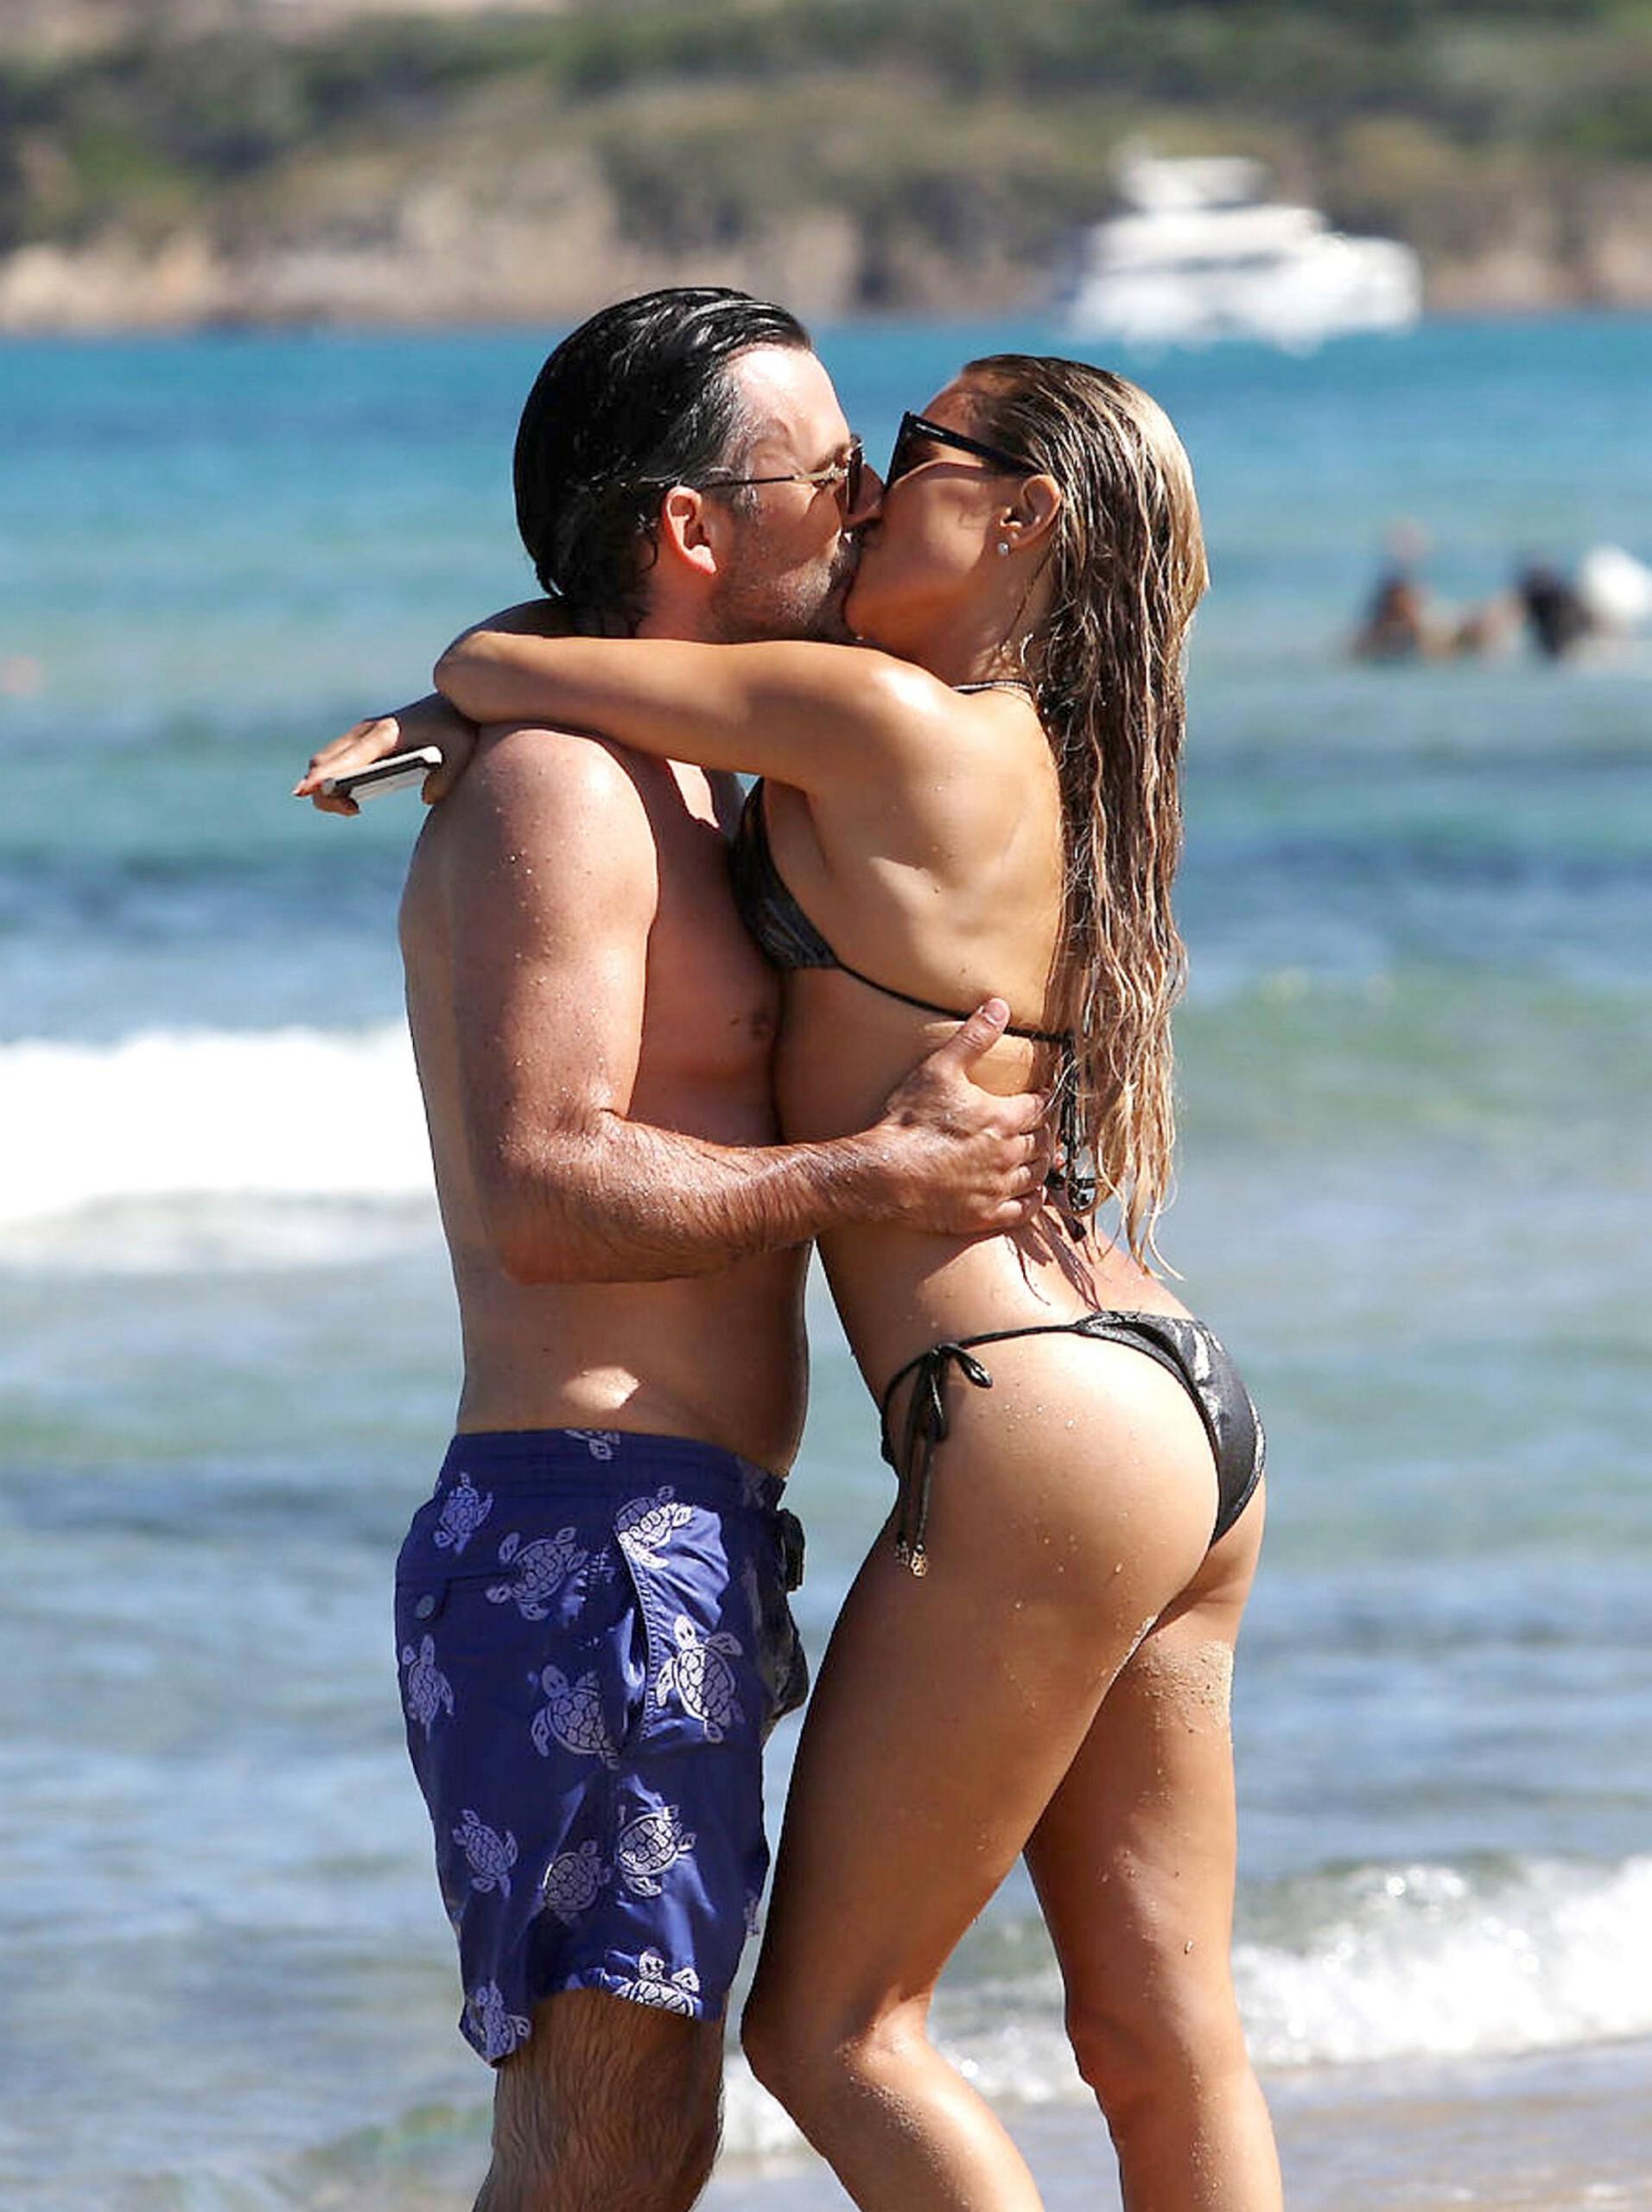 Sylvie Meis – Sexy Boobs In Bikini On The Beach In Saint Tropez 0016